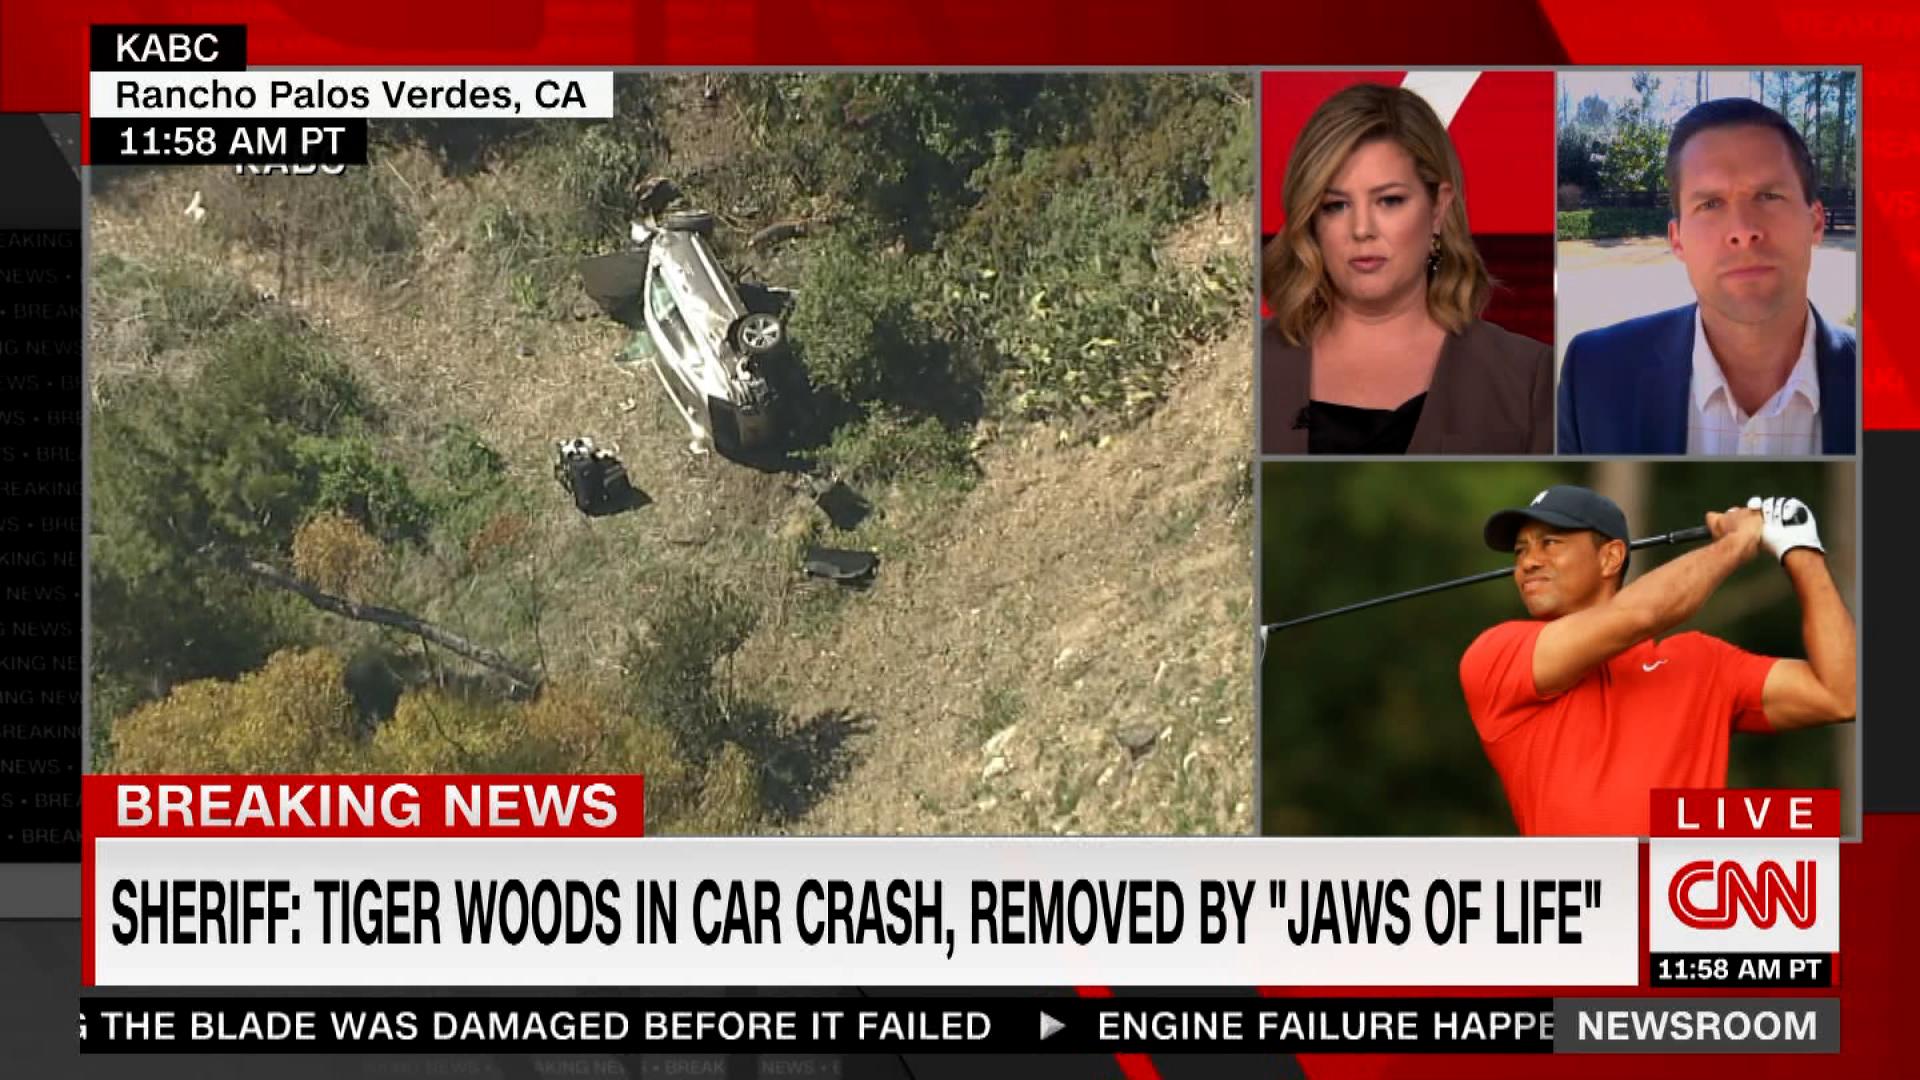 Tiger Woods injured in car crash Cf392031-2c14-4dee-8f24-73bb16ae36dc